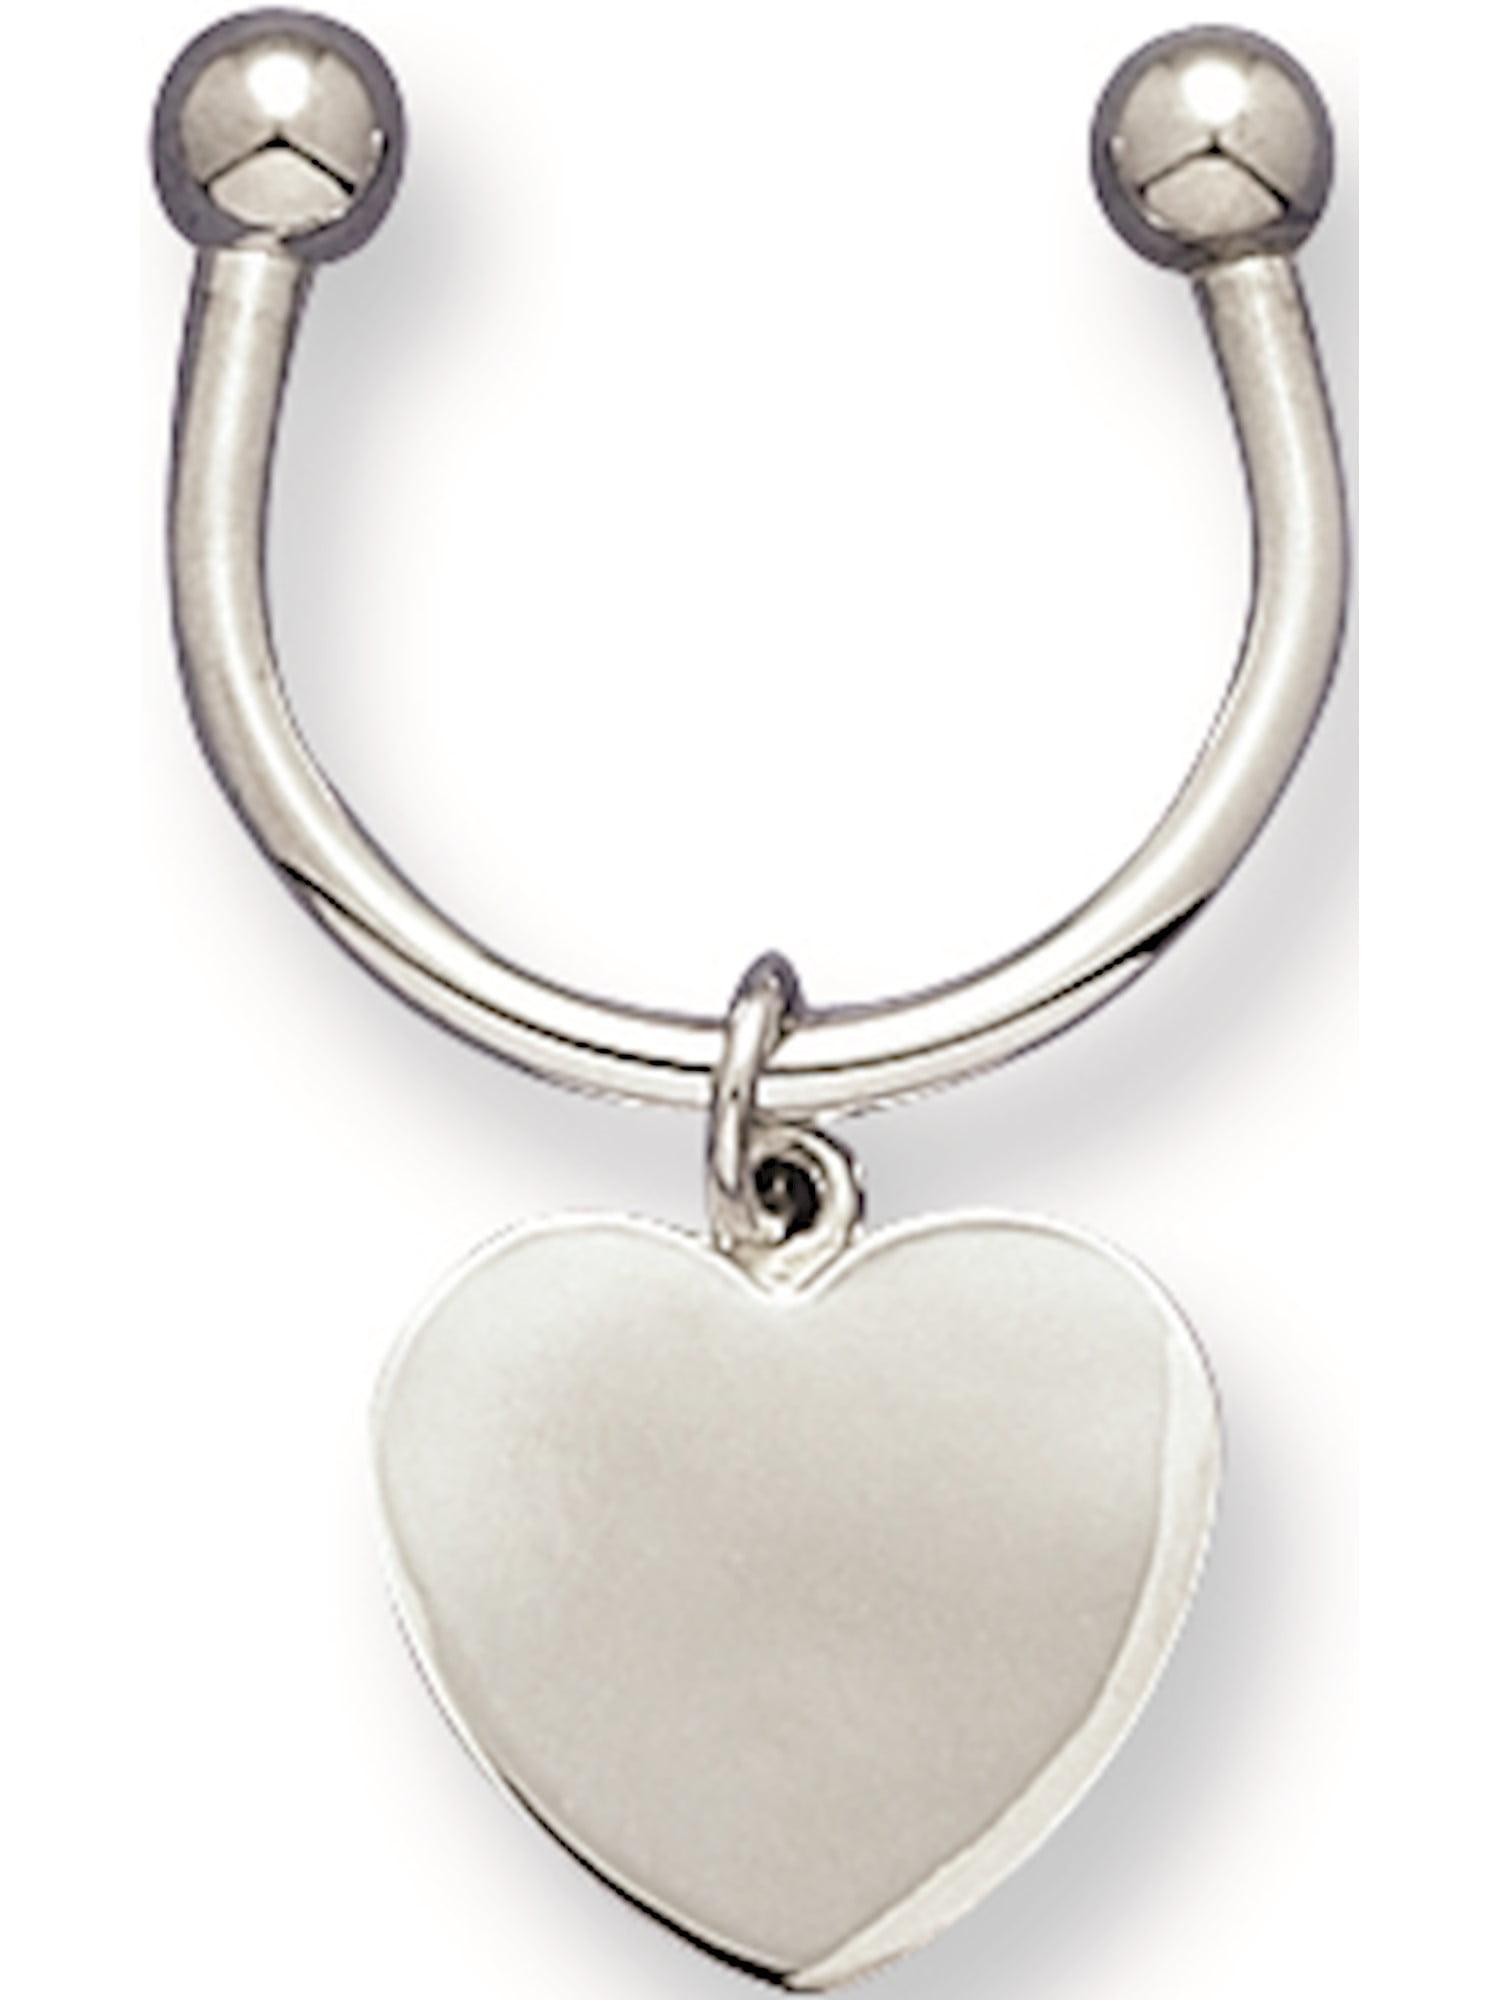 Heart Key Ring Designer Jewelry by Sweet Pea